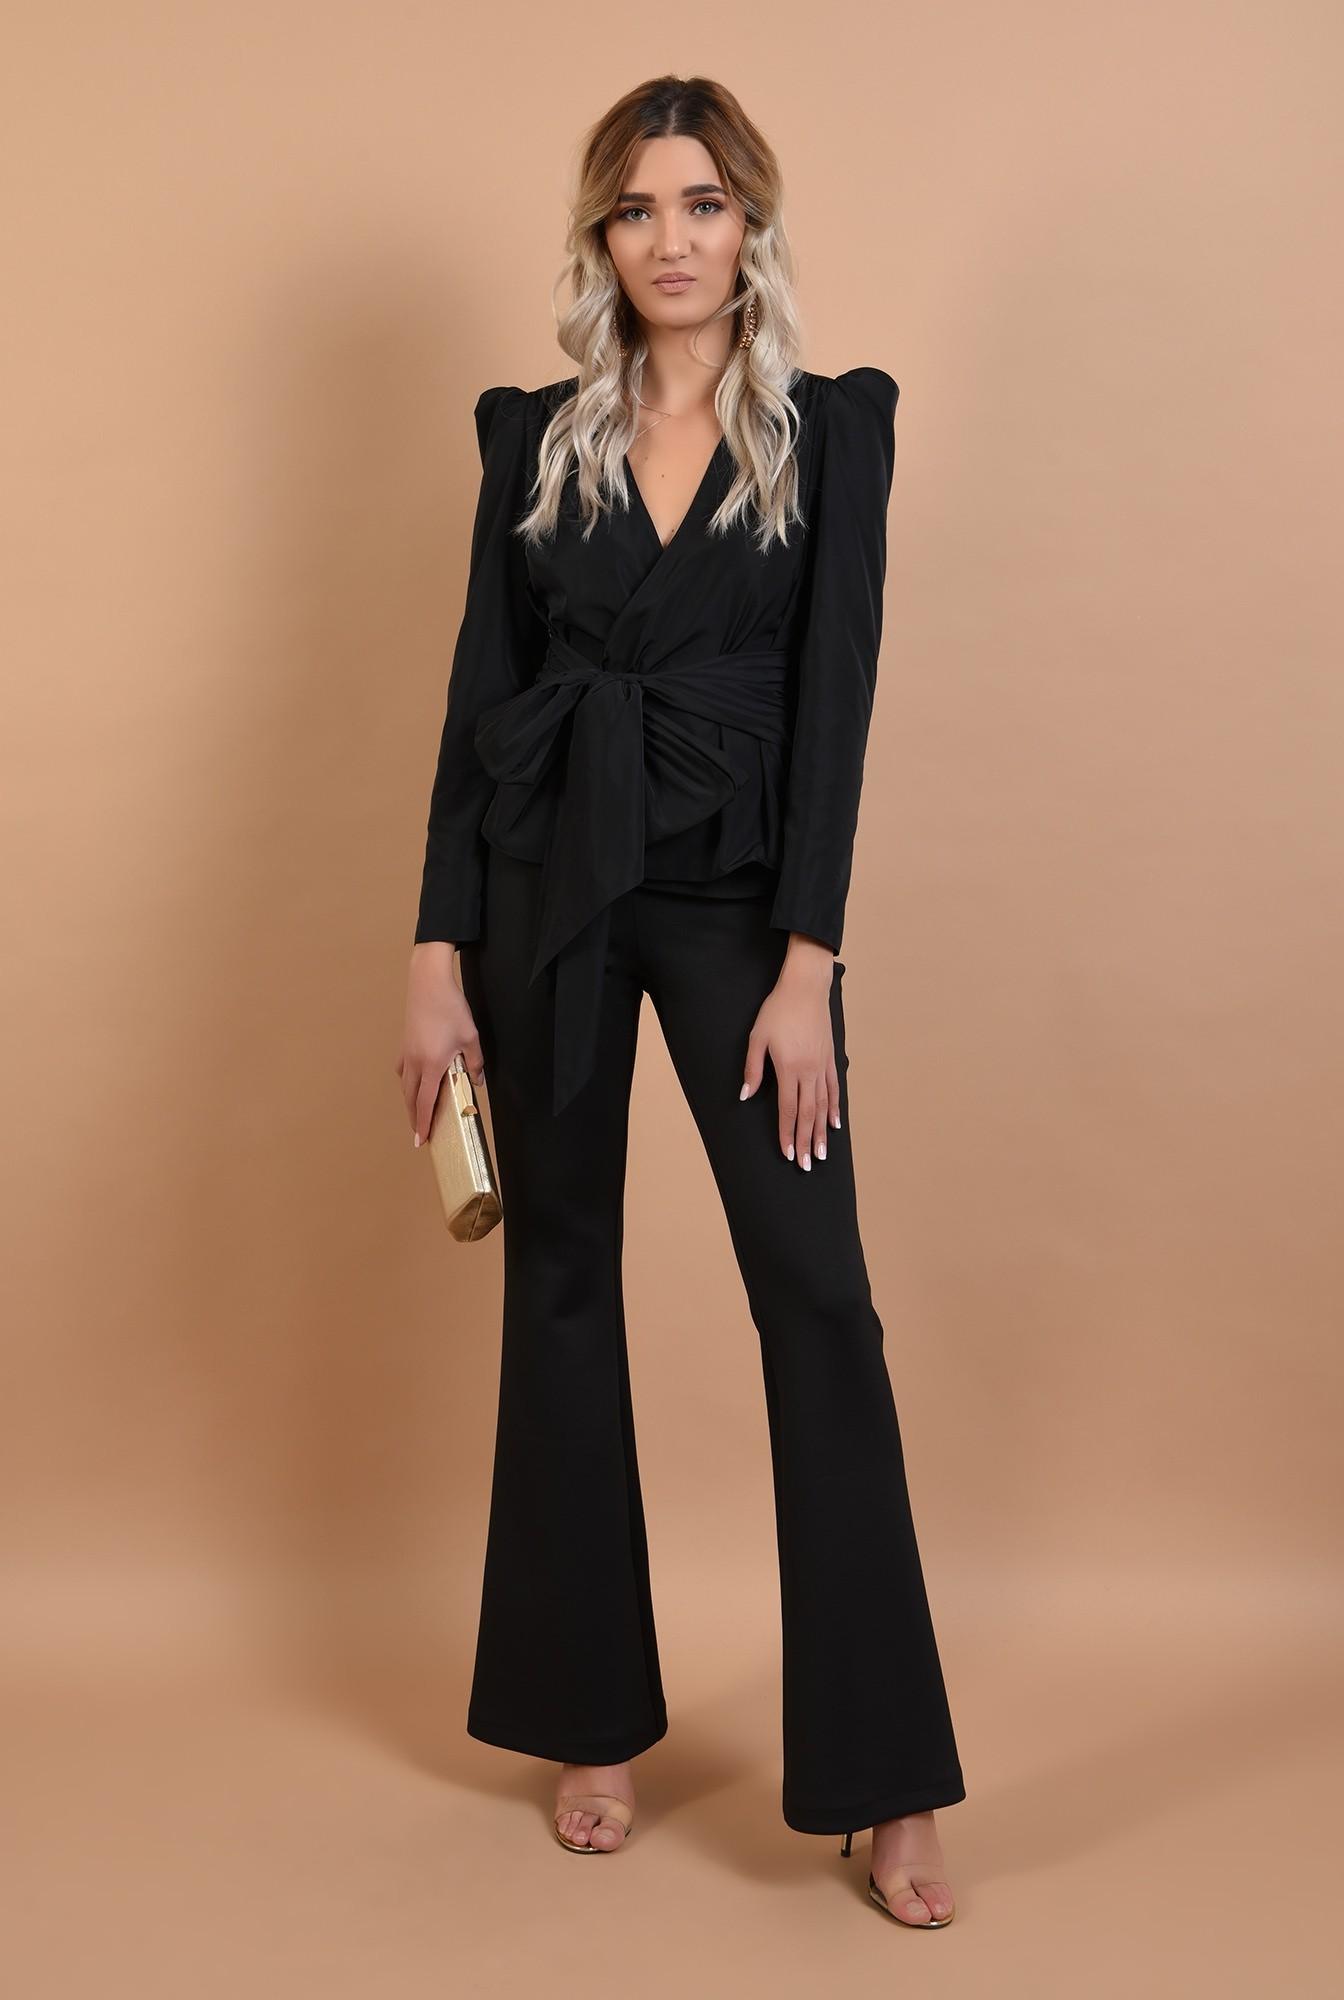 3 - bluza eleganta, neagra, cambrata, cu funda la talie, cret la umeri